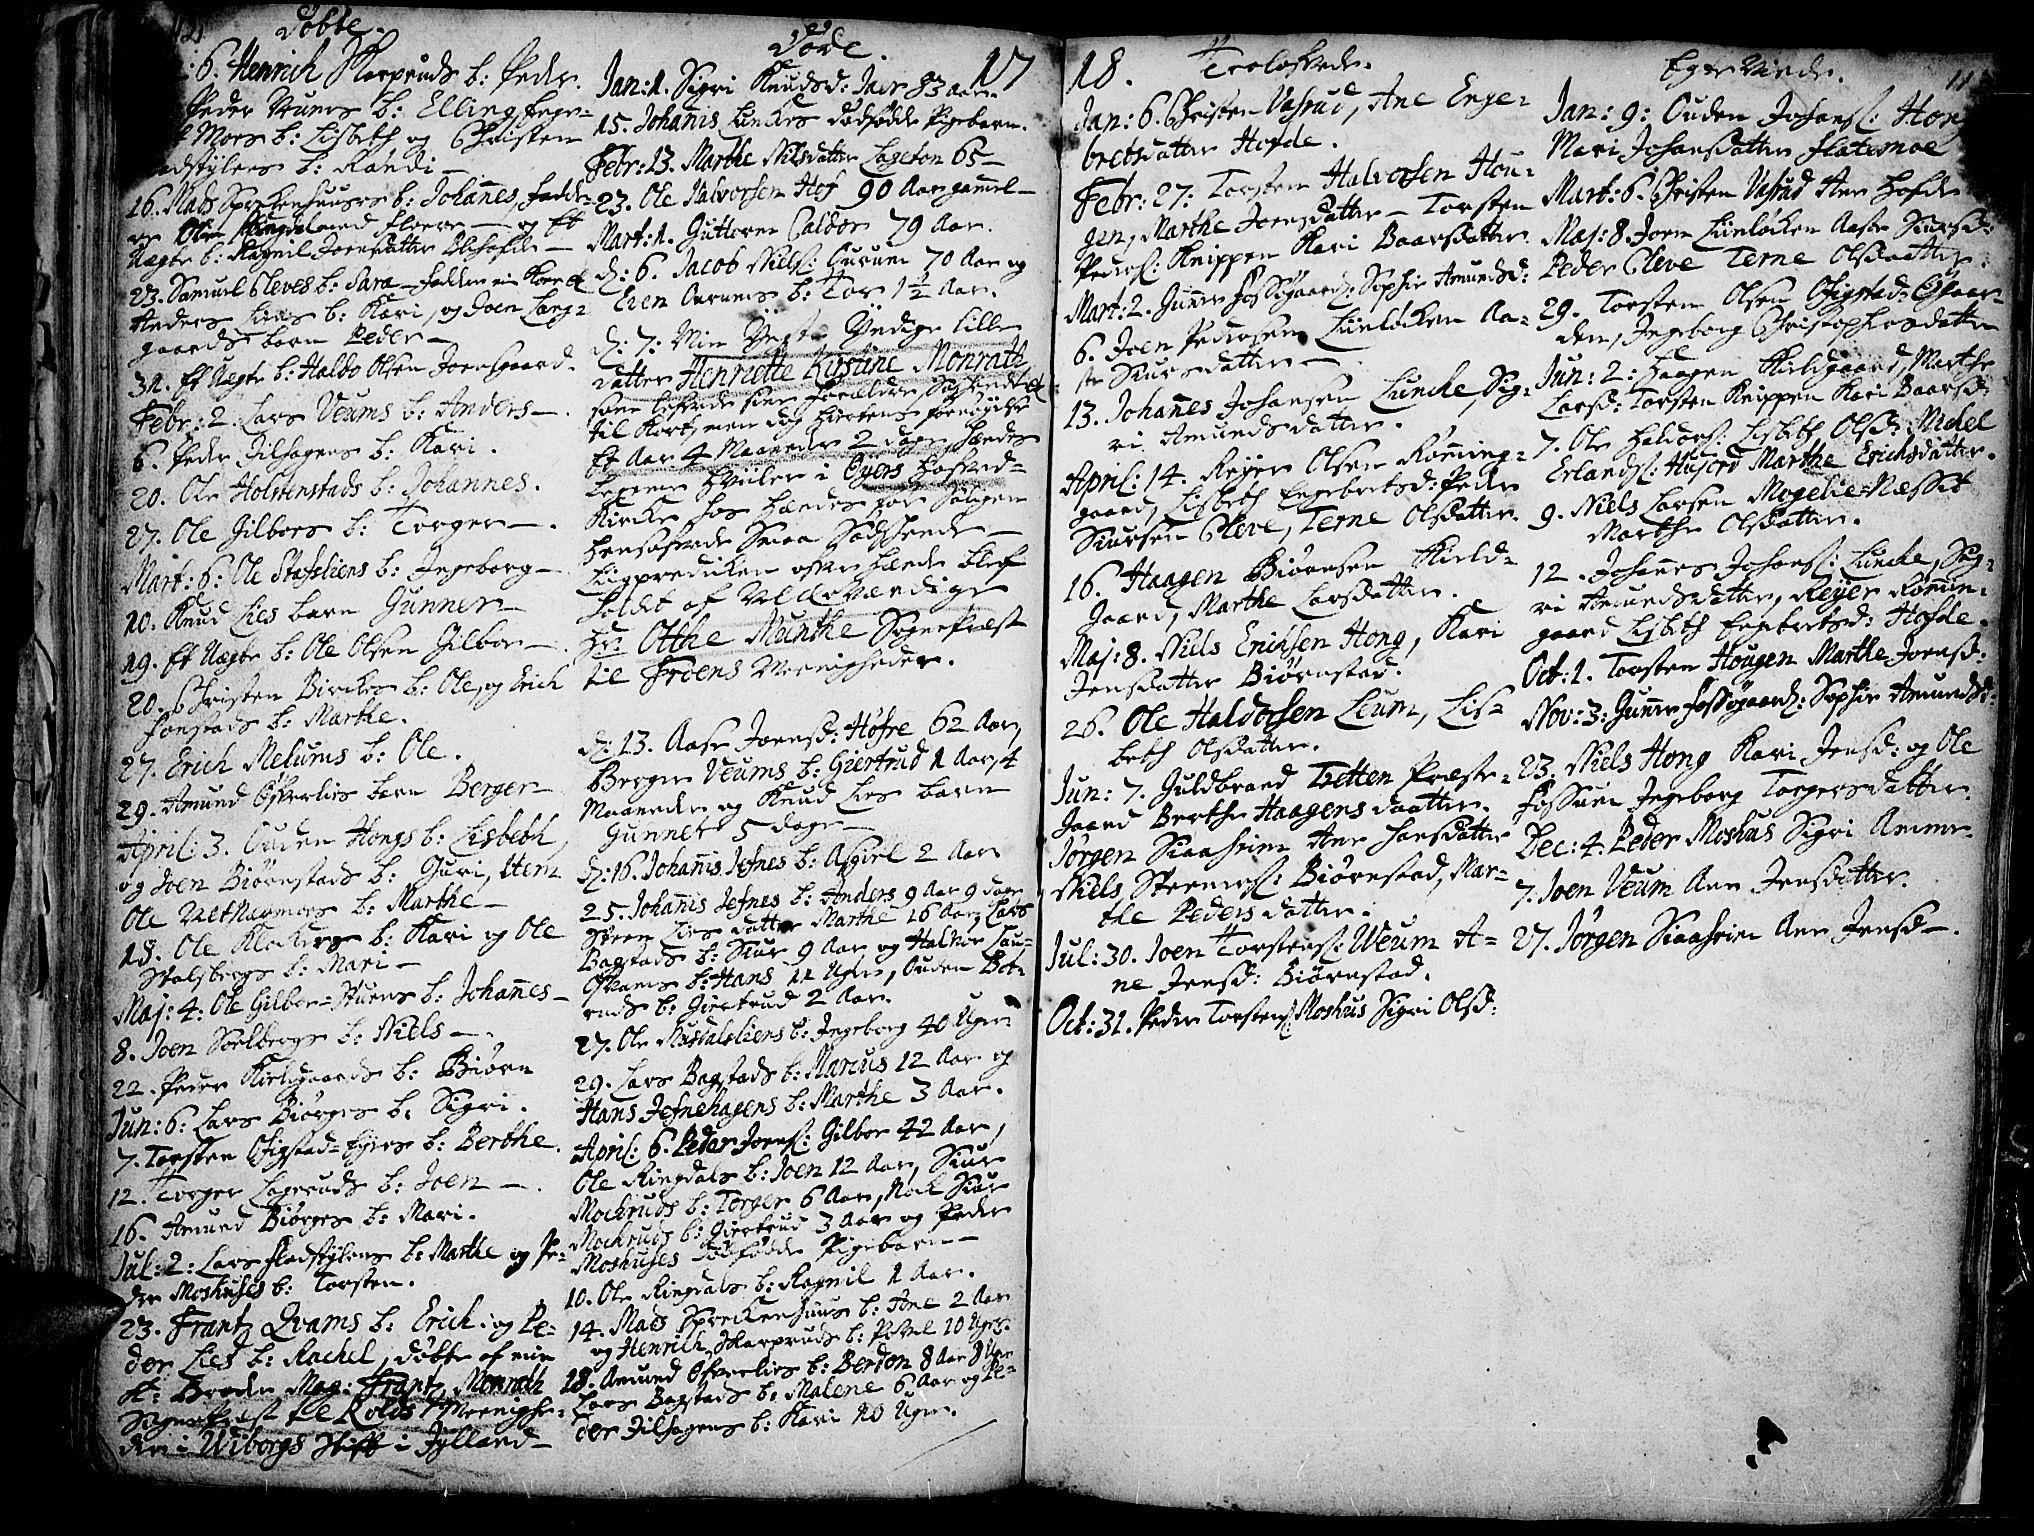 SAH, Øyer prestekontor, Ministerialbok nr. 1, 1671-1727, s. 112-113